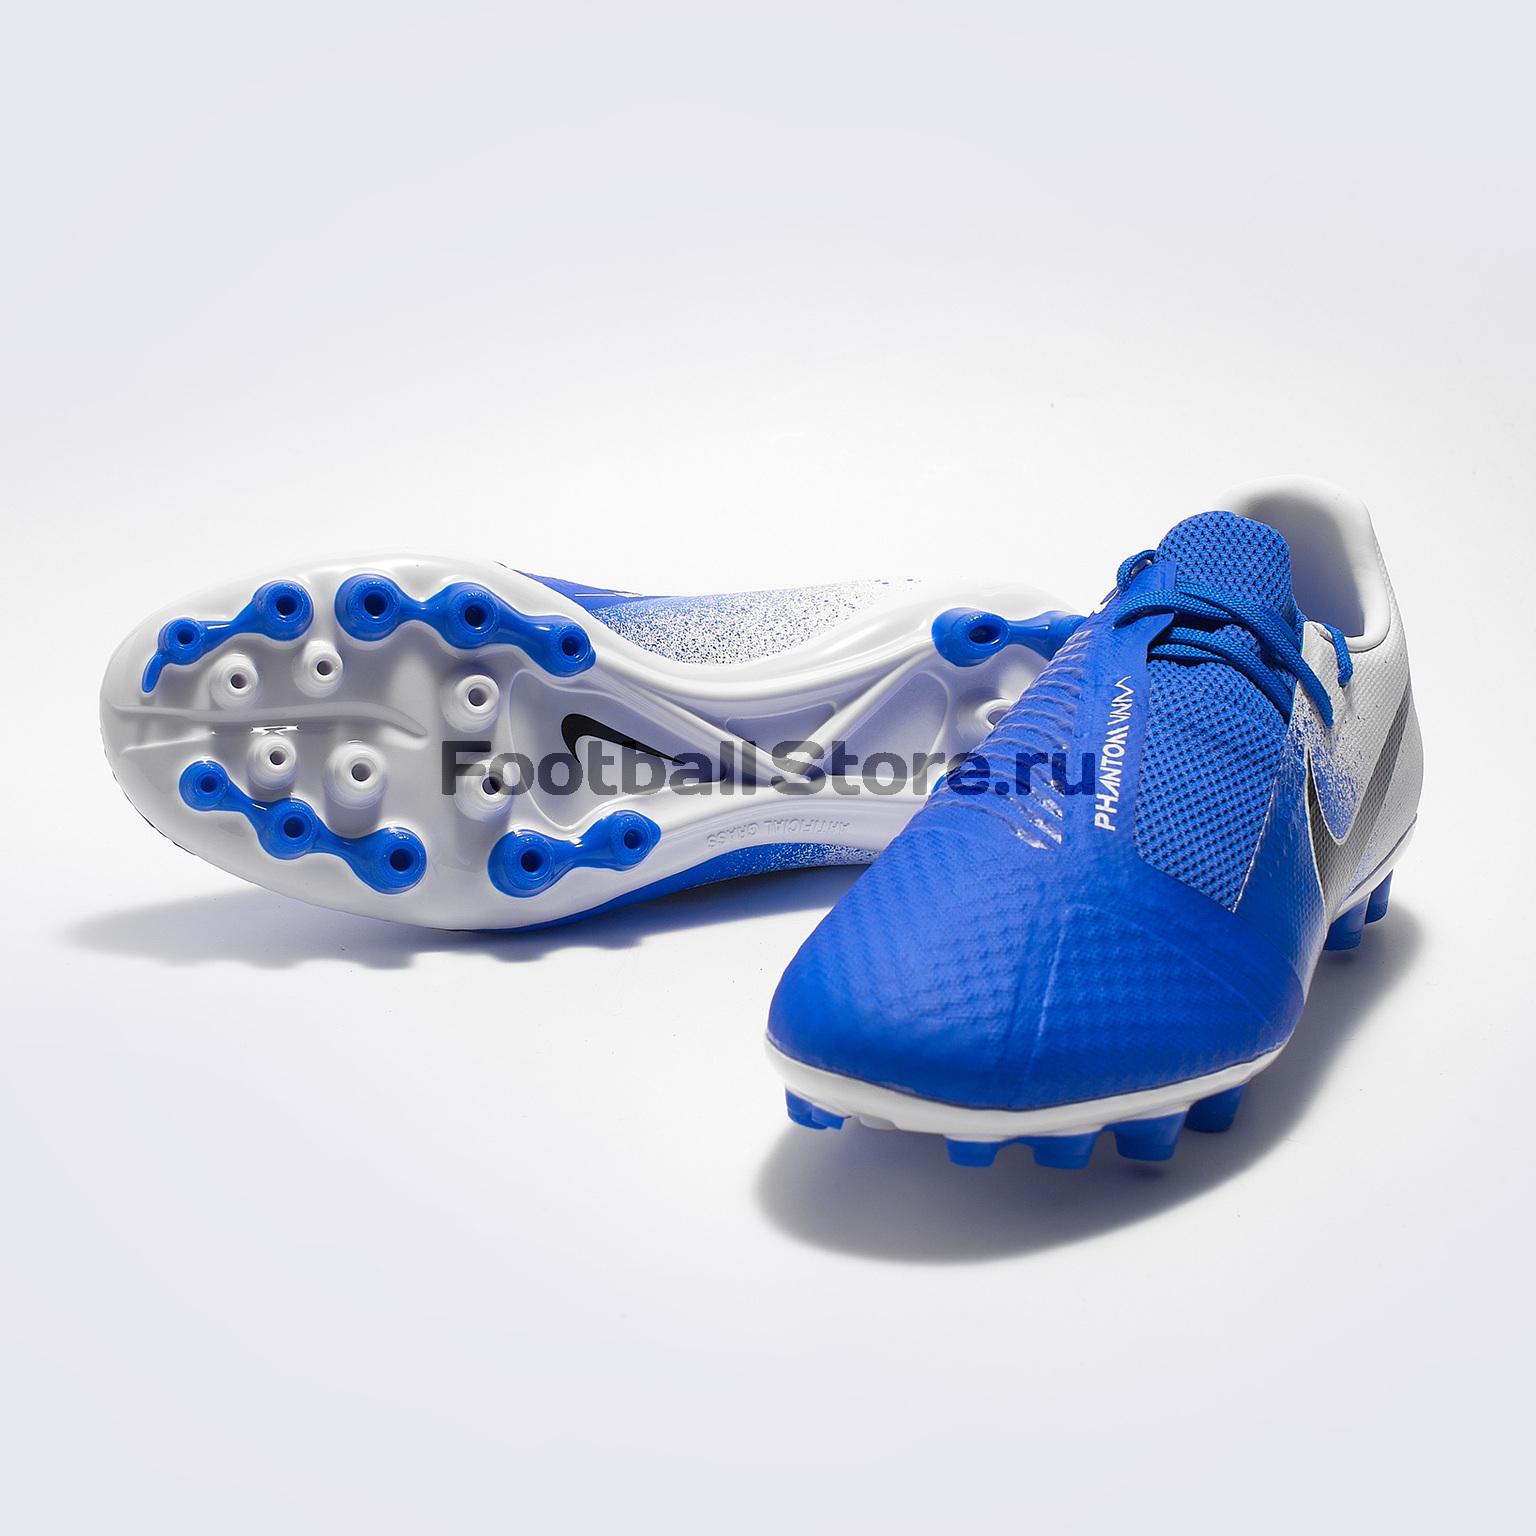 913a9315 ... Бутсы Nike Phantom Venom Academy AG-R AV3038-104. О ТОВАРЕ; РАСЧЕТ  ДОСТАВКИ